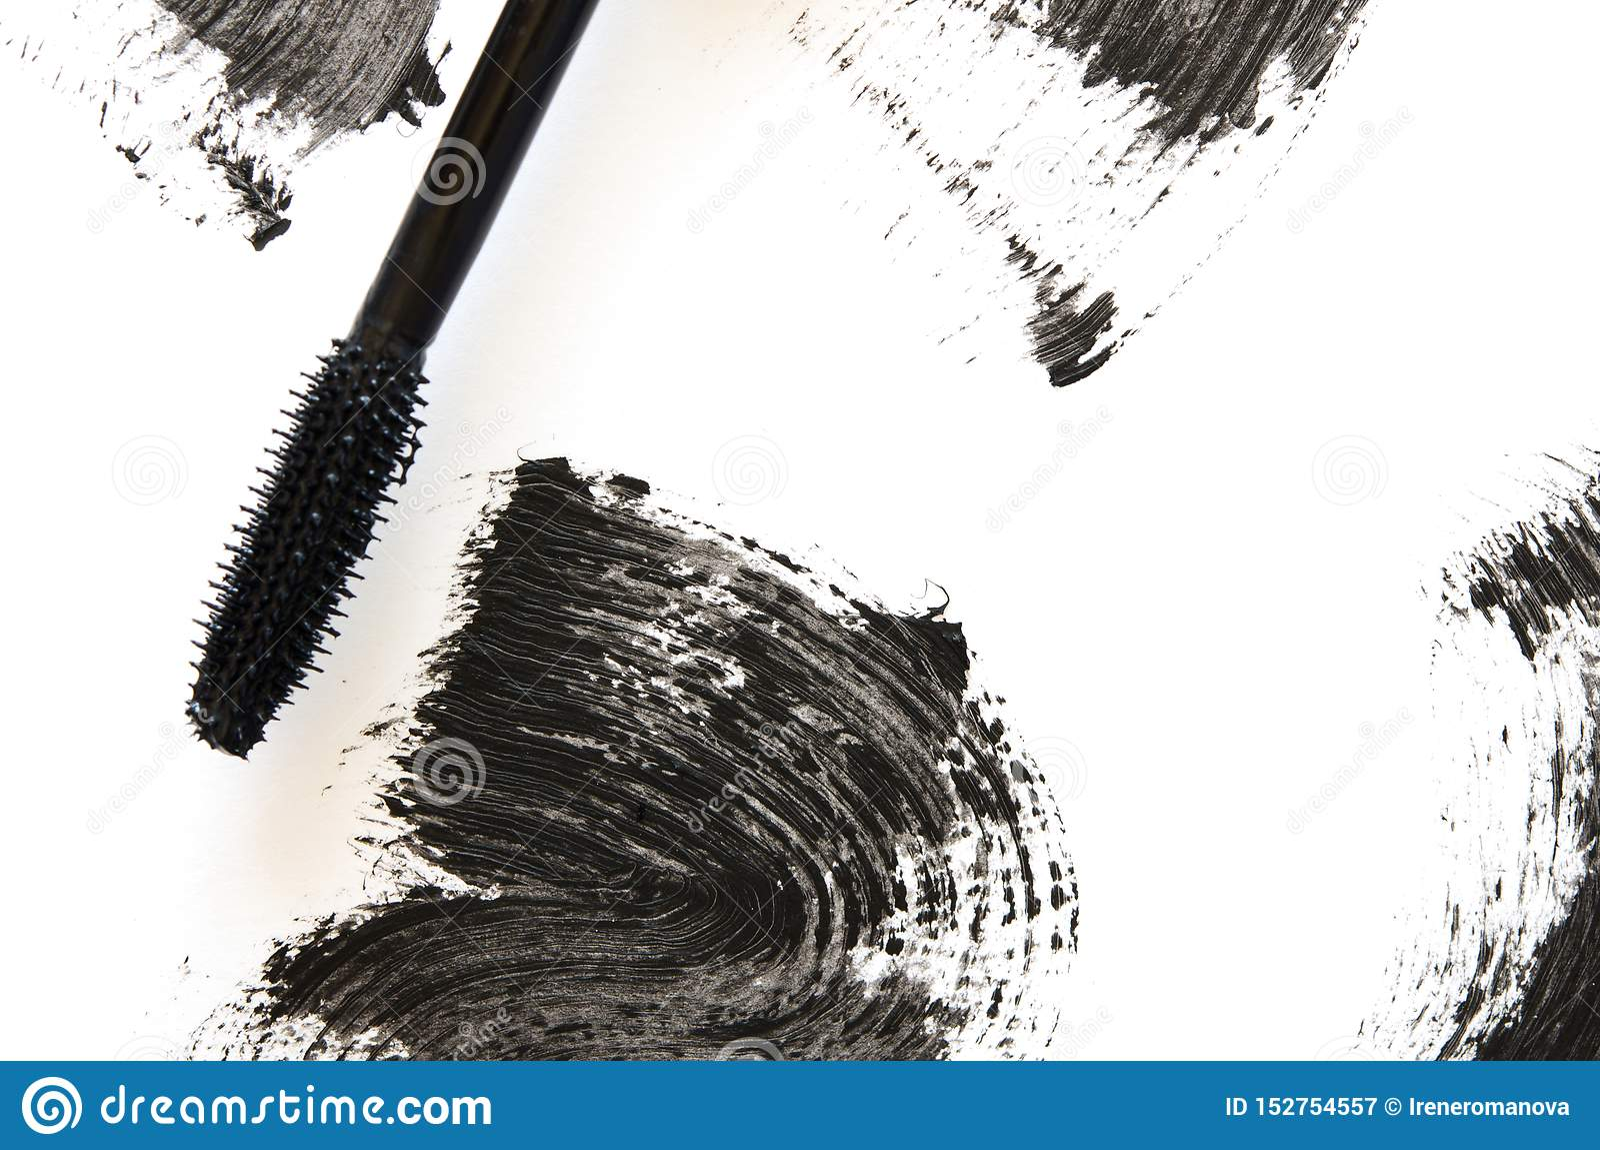 Stroke of black mascara with applicator brush close-up, isolated on white background.